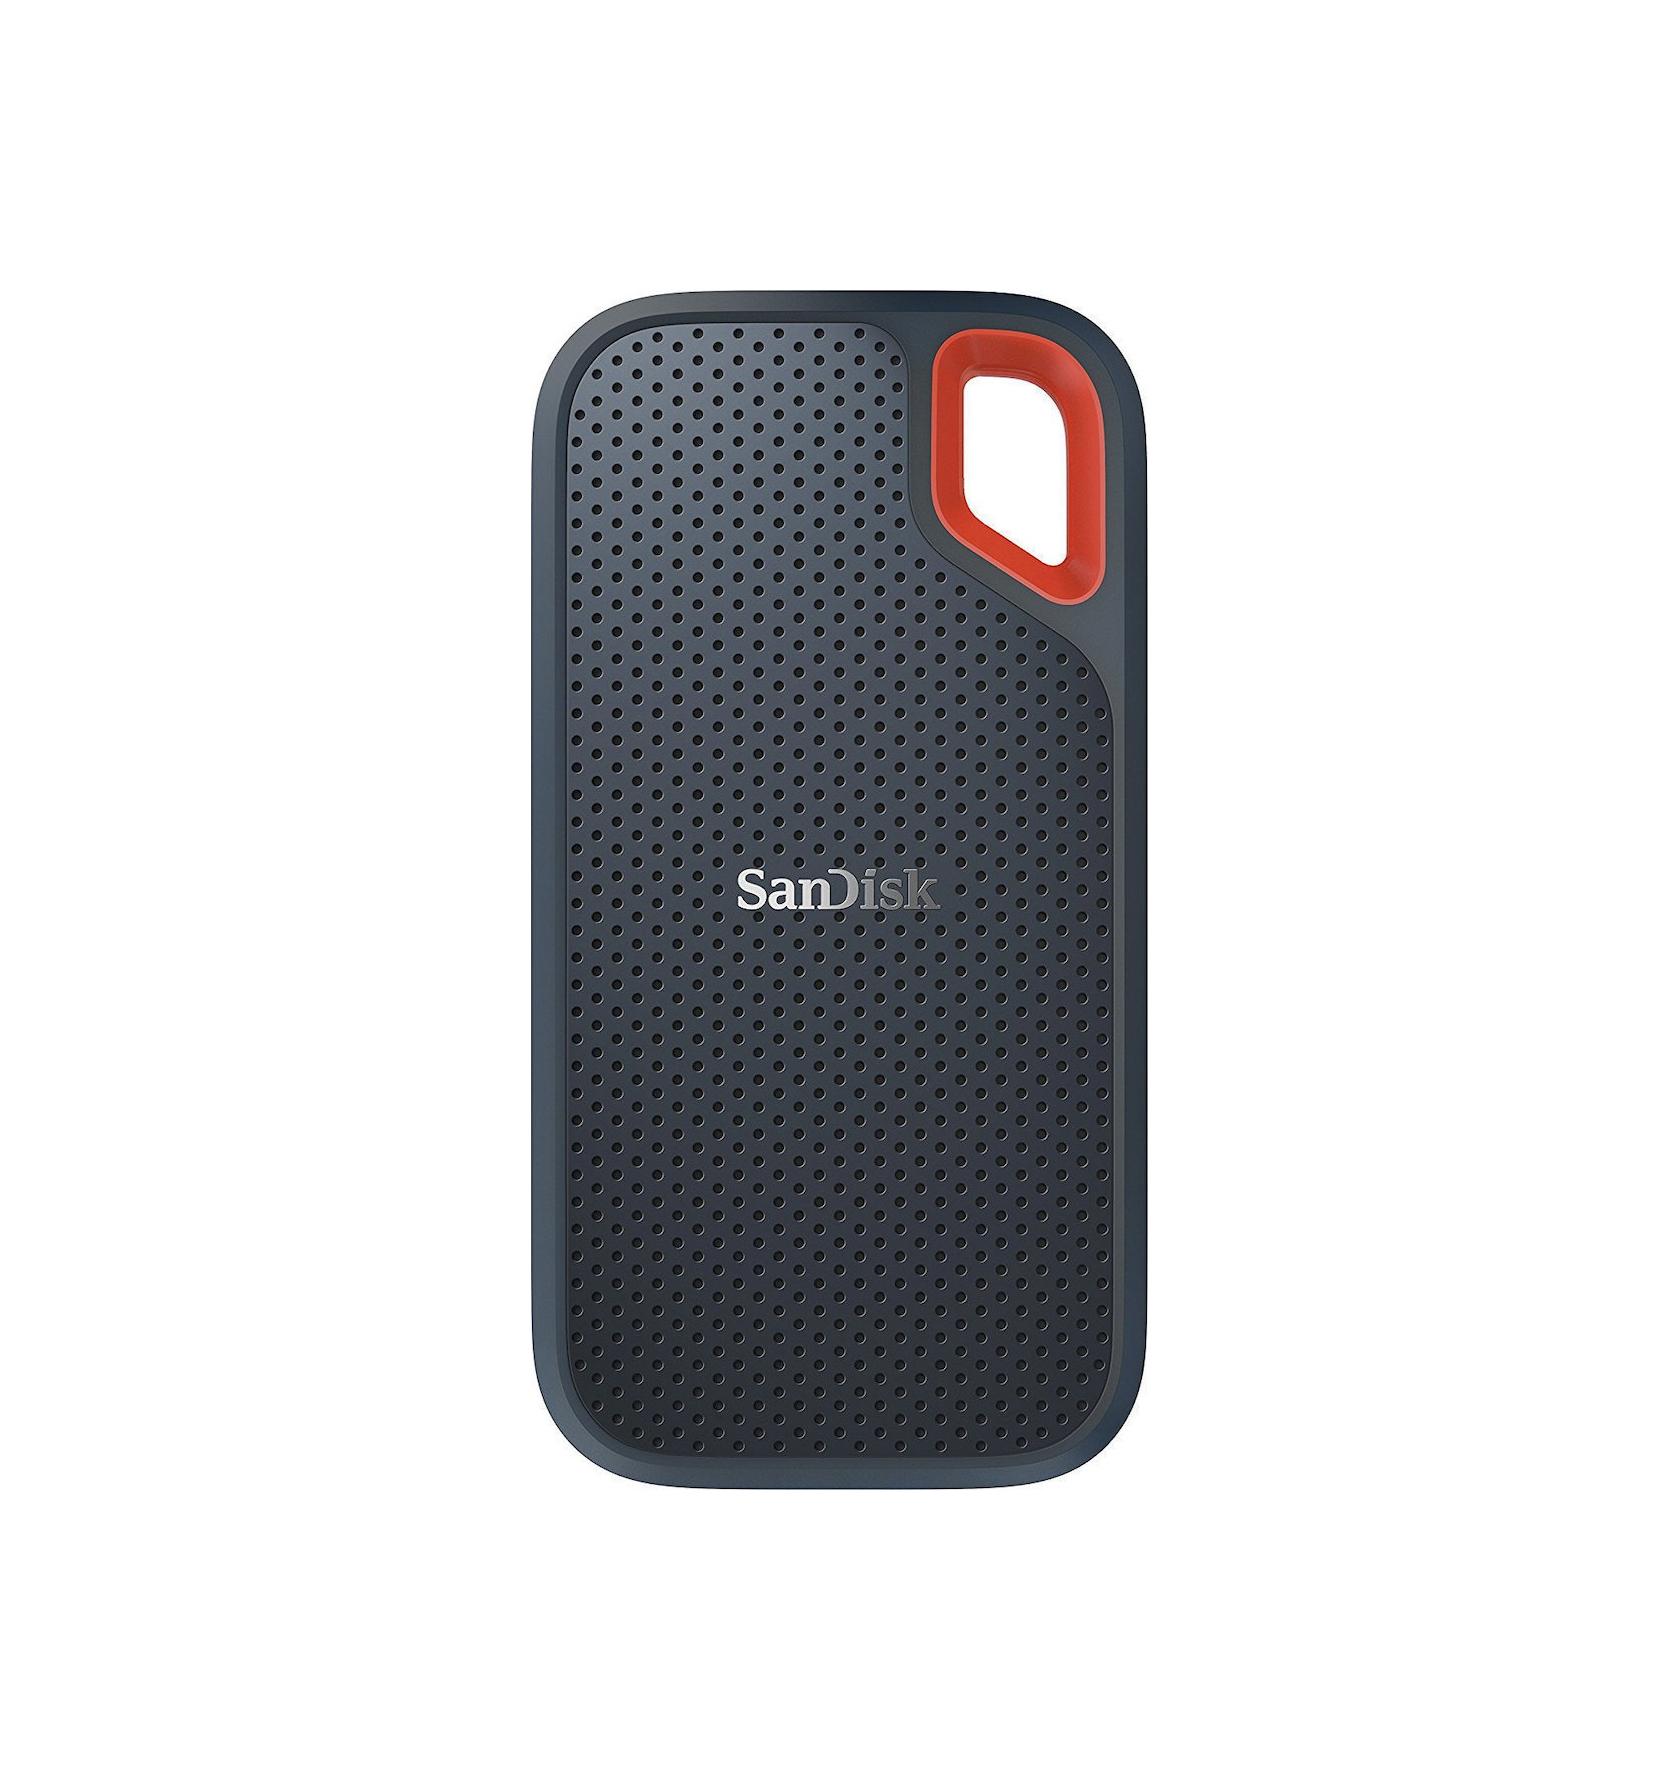 Sandisk Extreme Portable SSD 500GB SDSSDE60-500G-G25 Σκληρός Δίσκος